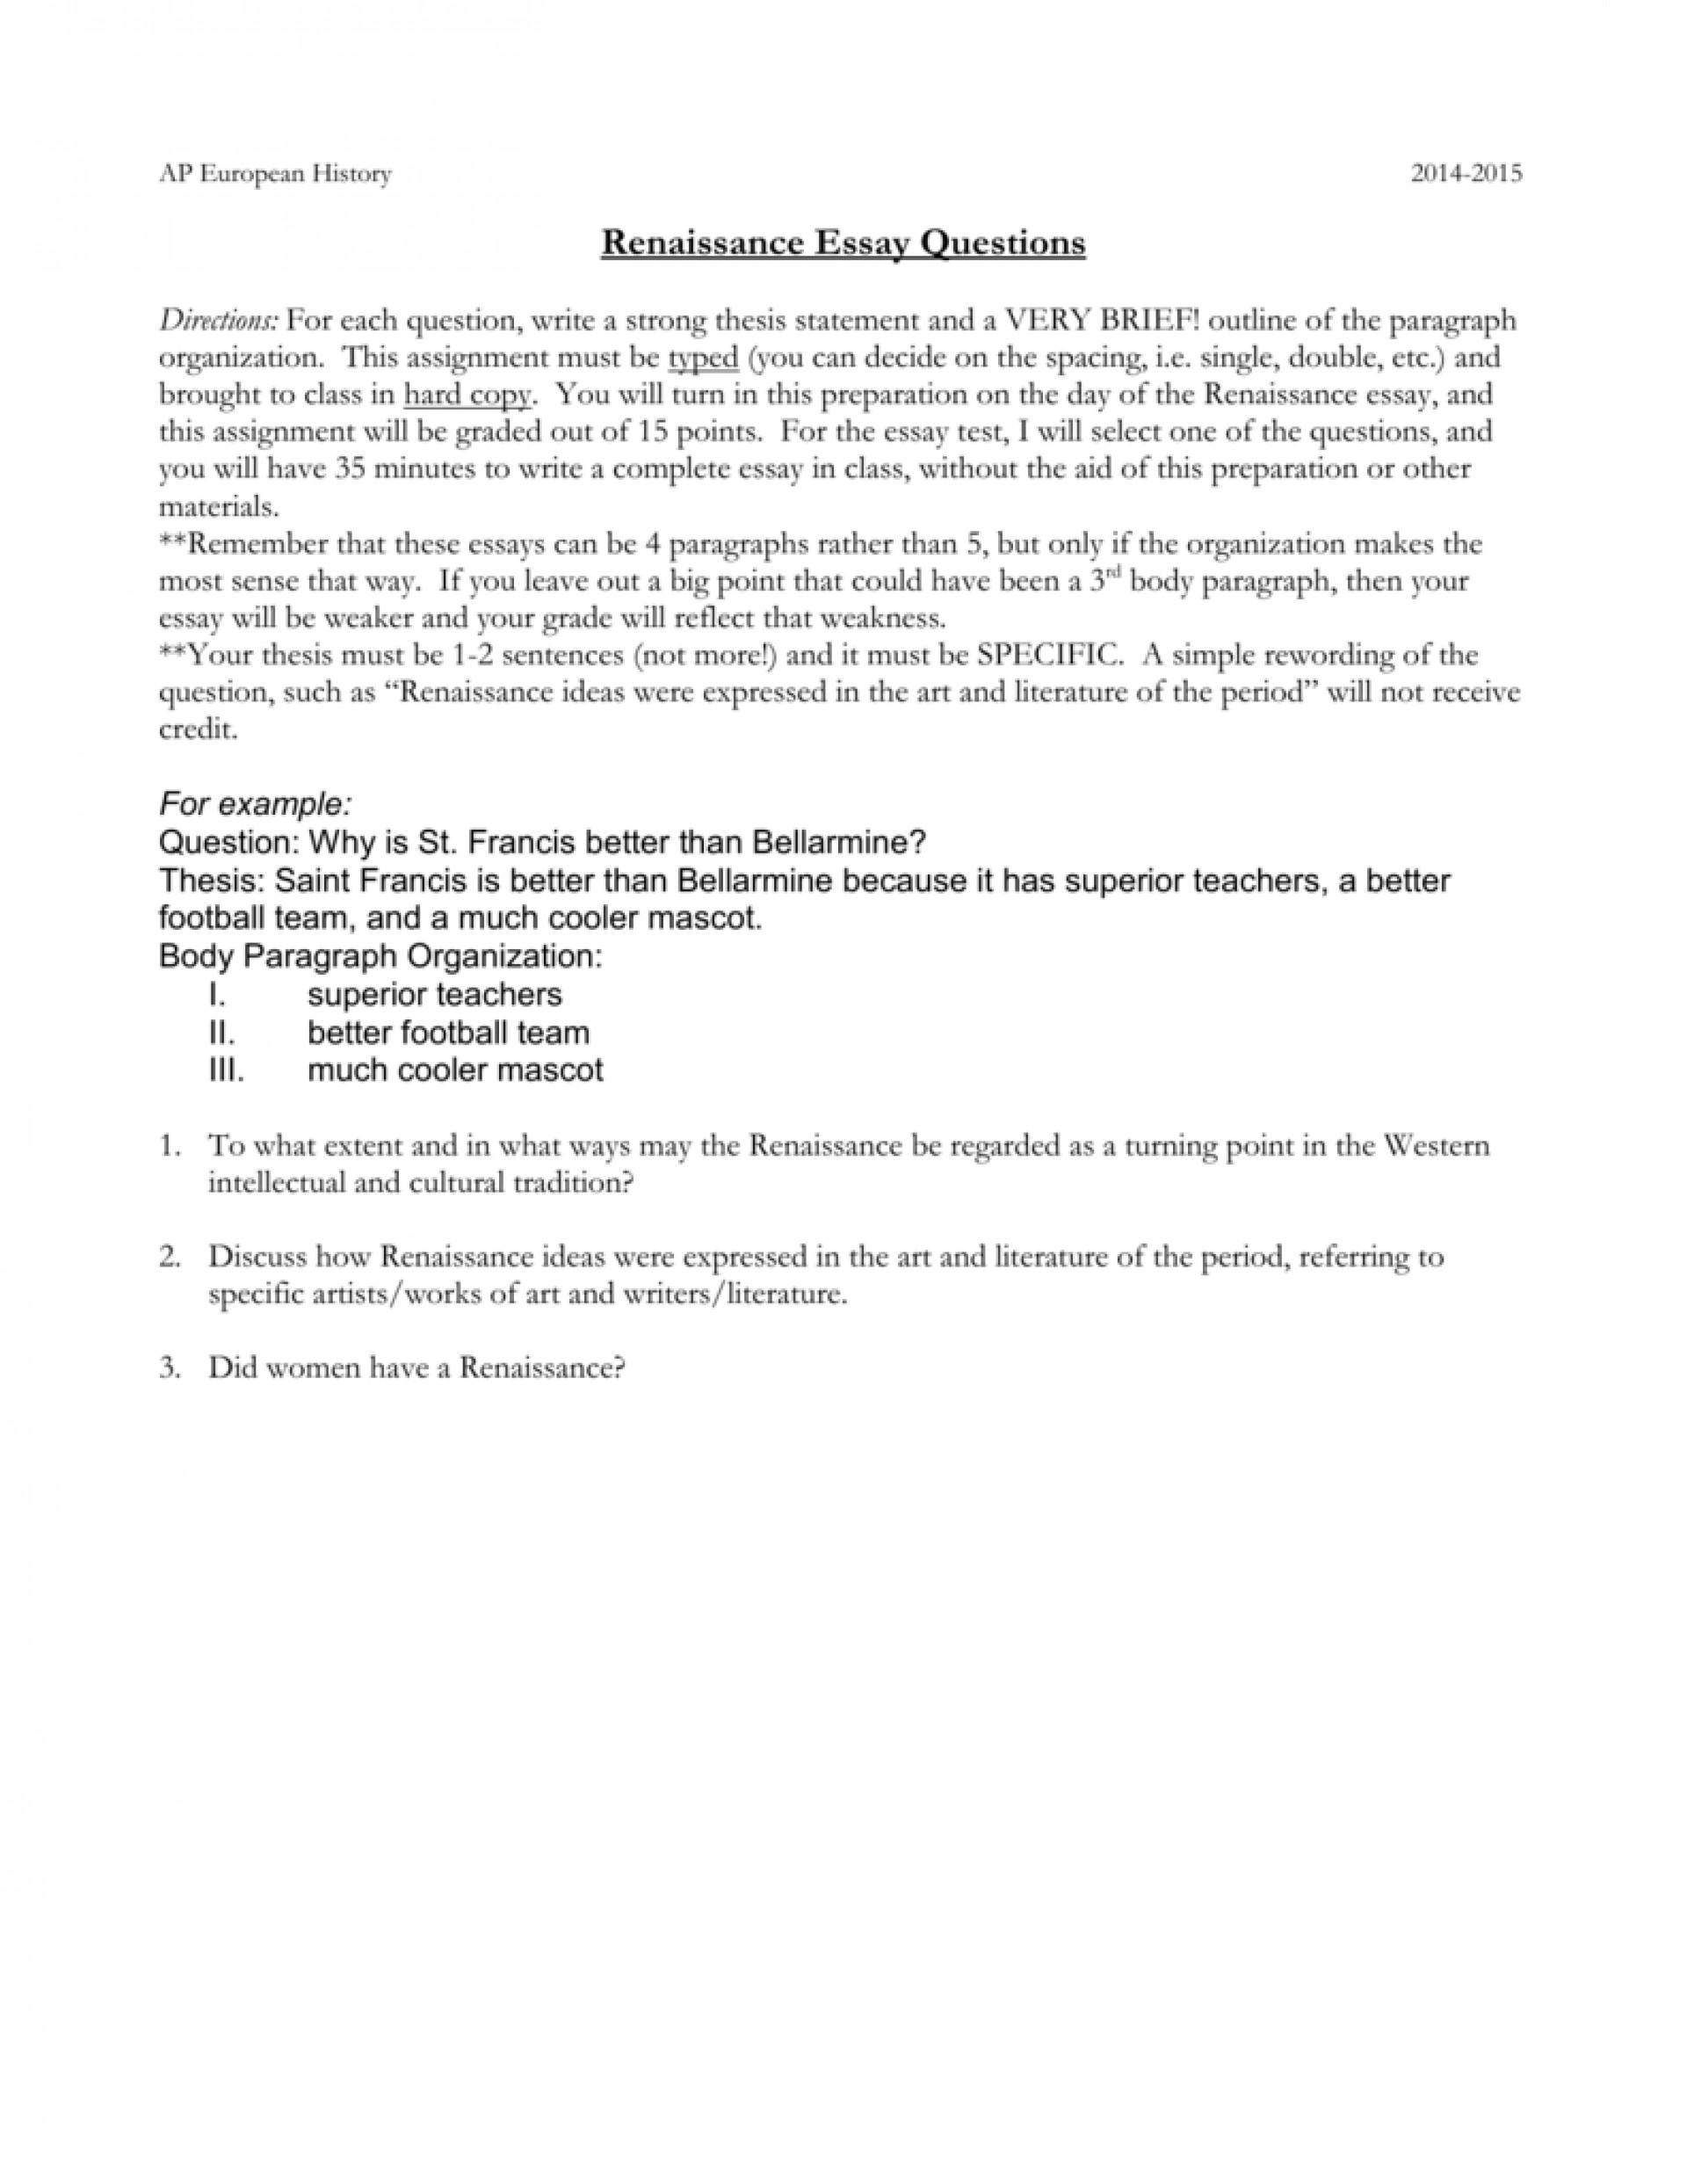 006 Renaissance Essay 008916690 1 Surprising Harlem Introduction Sample Pdf 1920